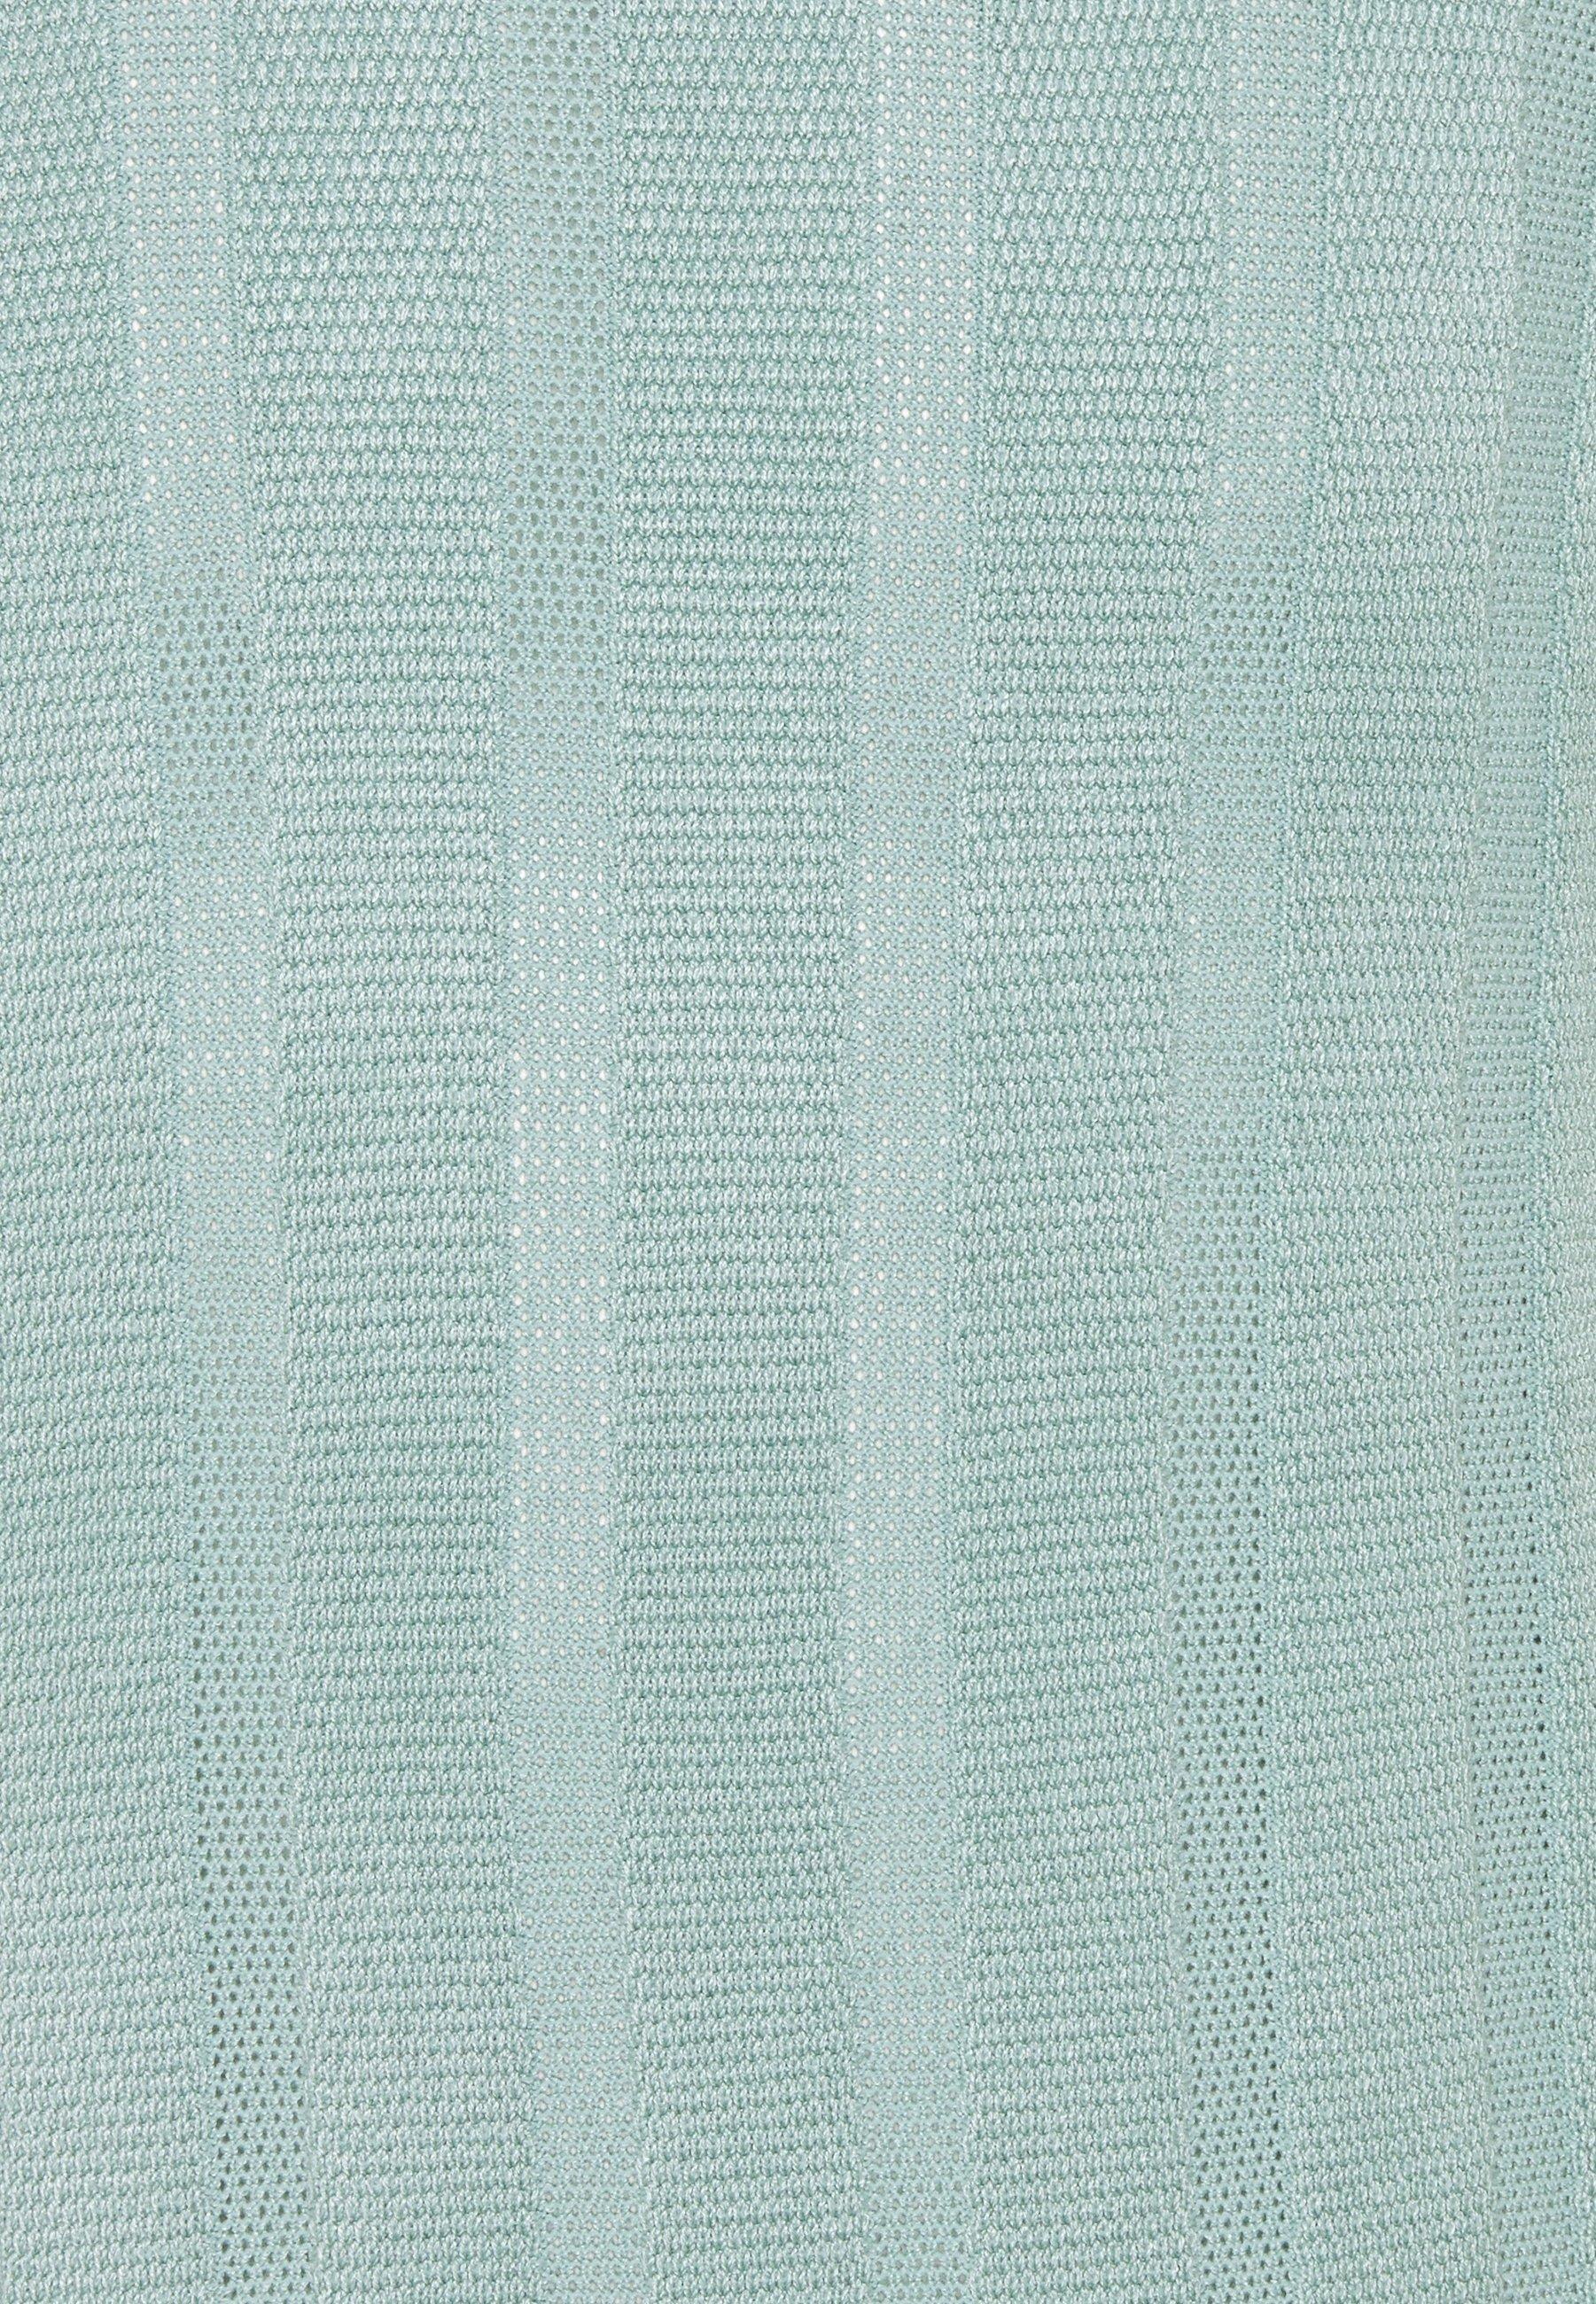 Factory Outlet New Release Men's Clothing INDICODE JEANS ATKINSON Basic T-shirt blue surf 8x9GVJxDf UKf4EC514